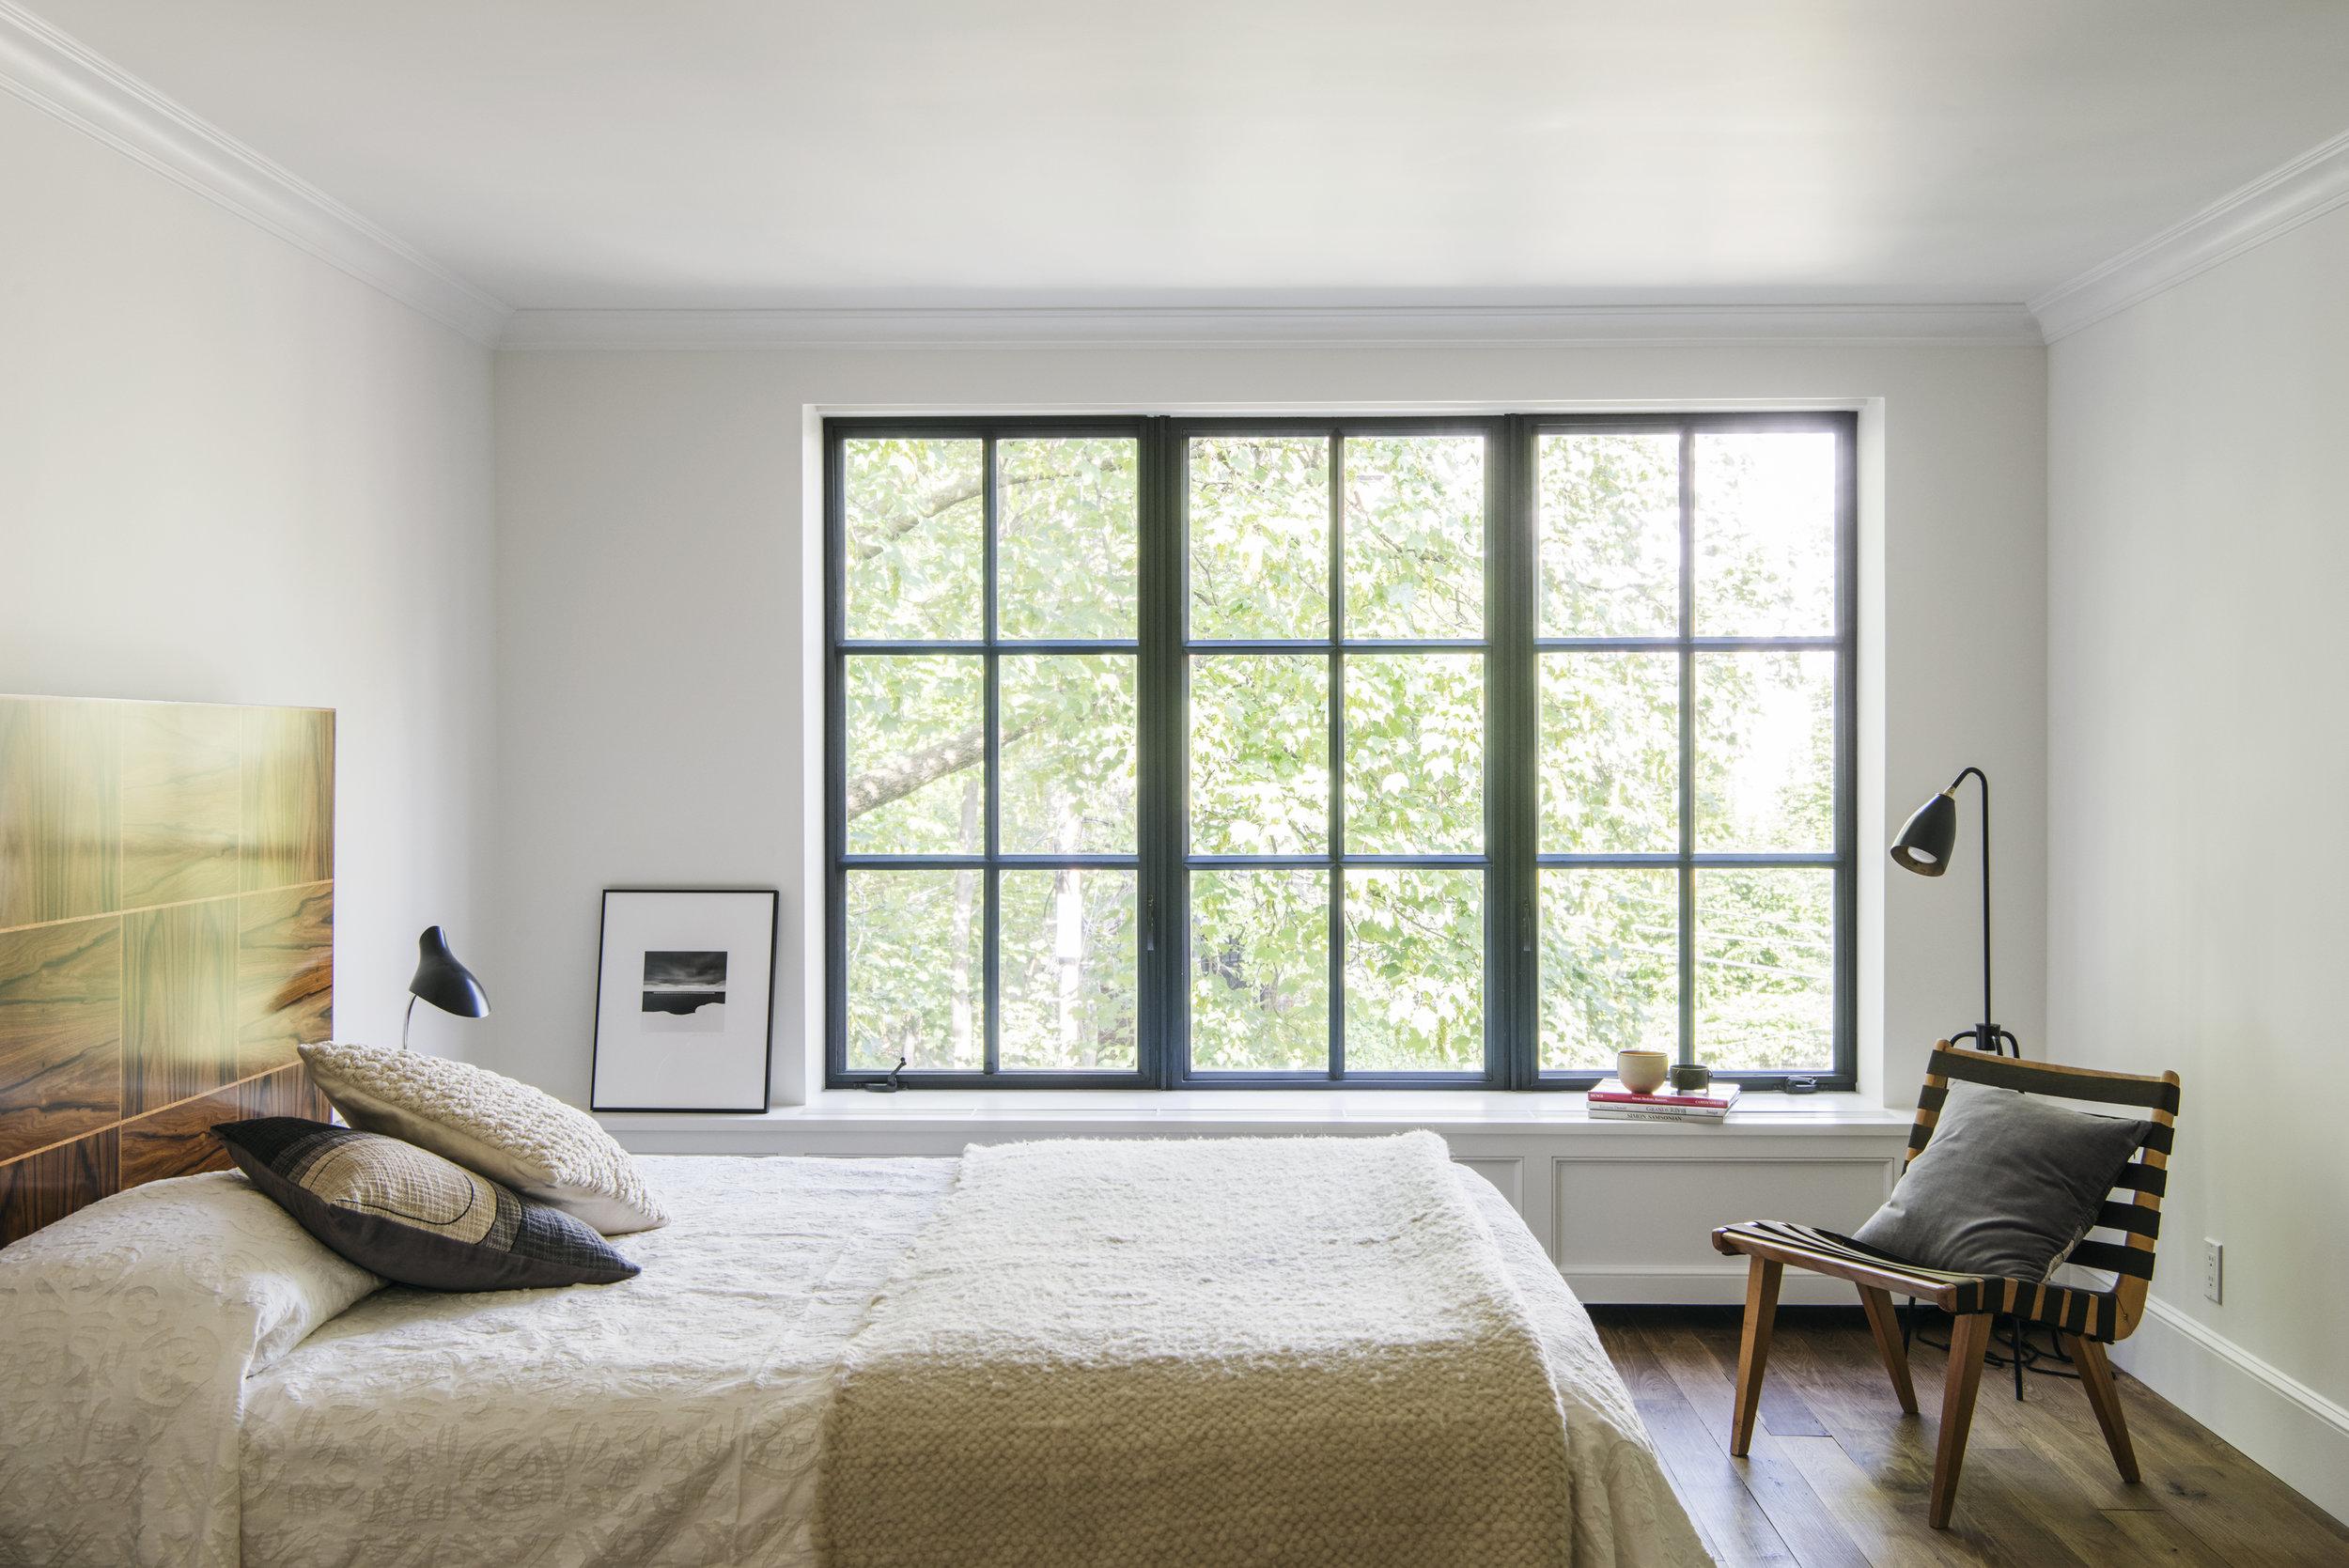 Design & Photo:  Elizabeth Roberts Architecture & Design, PC